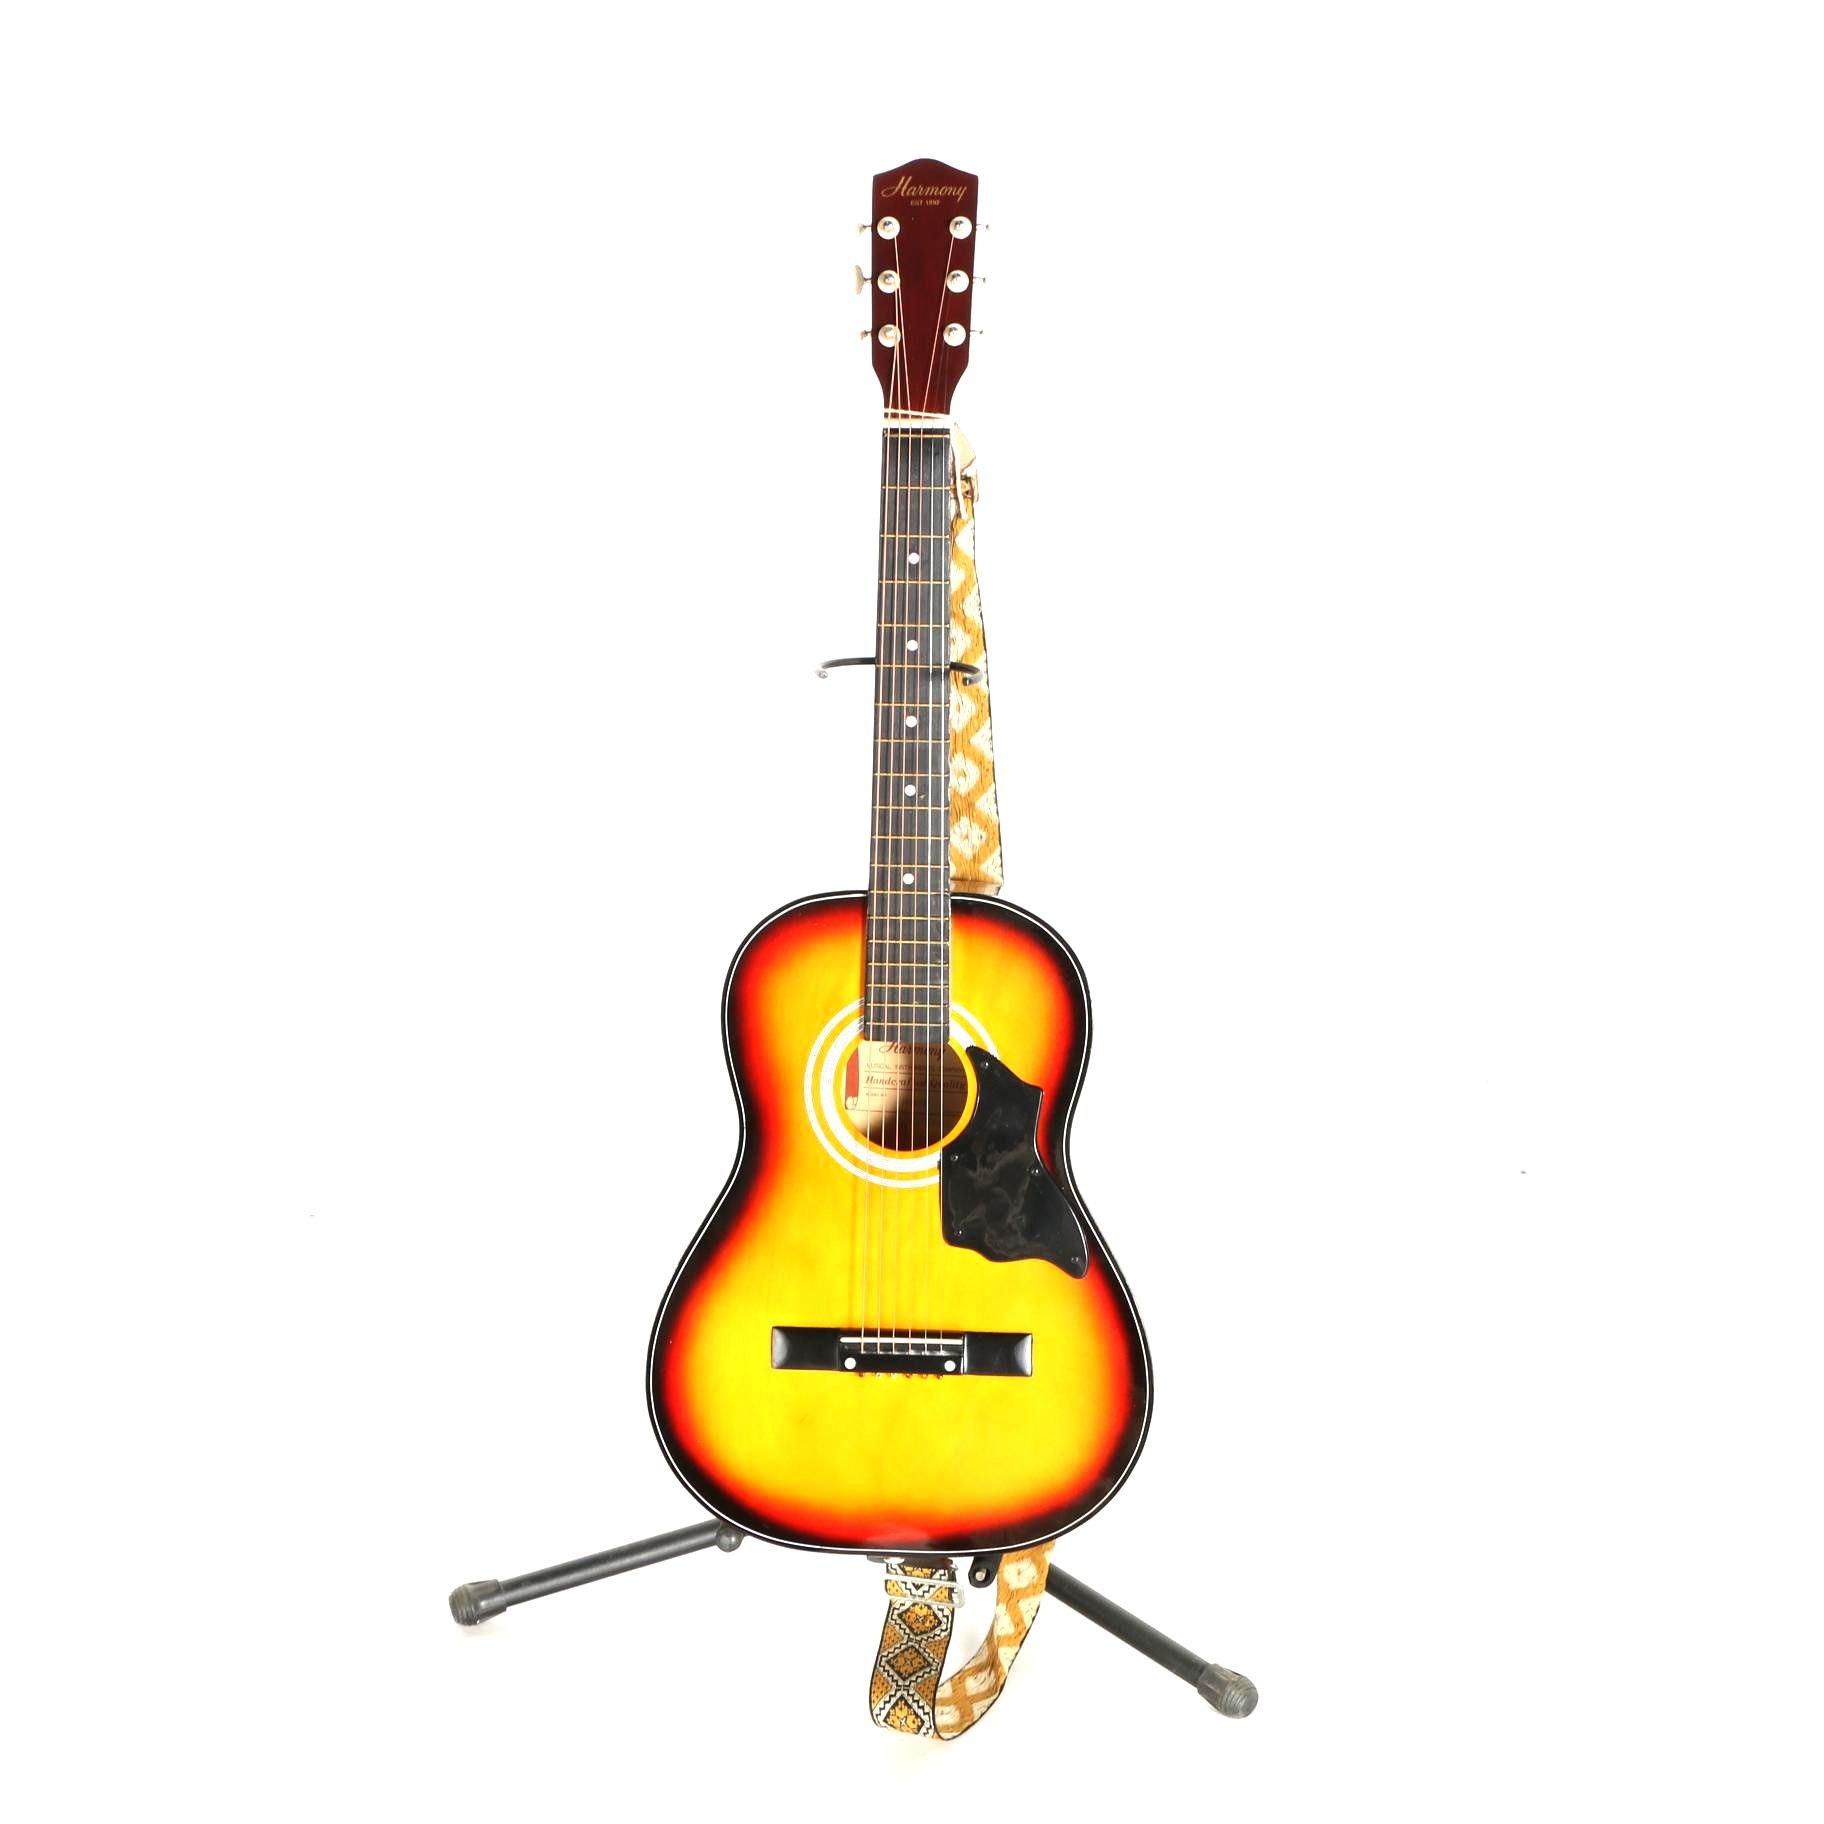 Vintage Harmony Acoustic Guitar